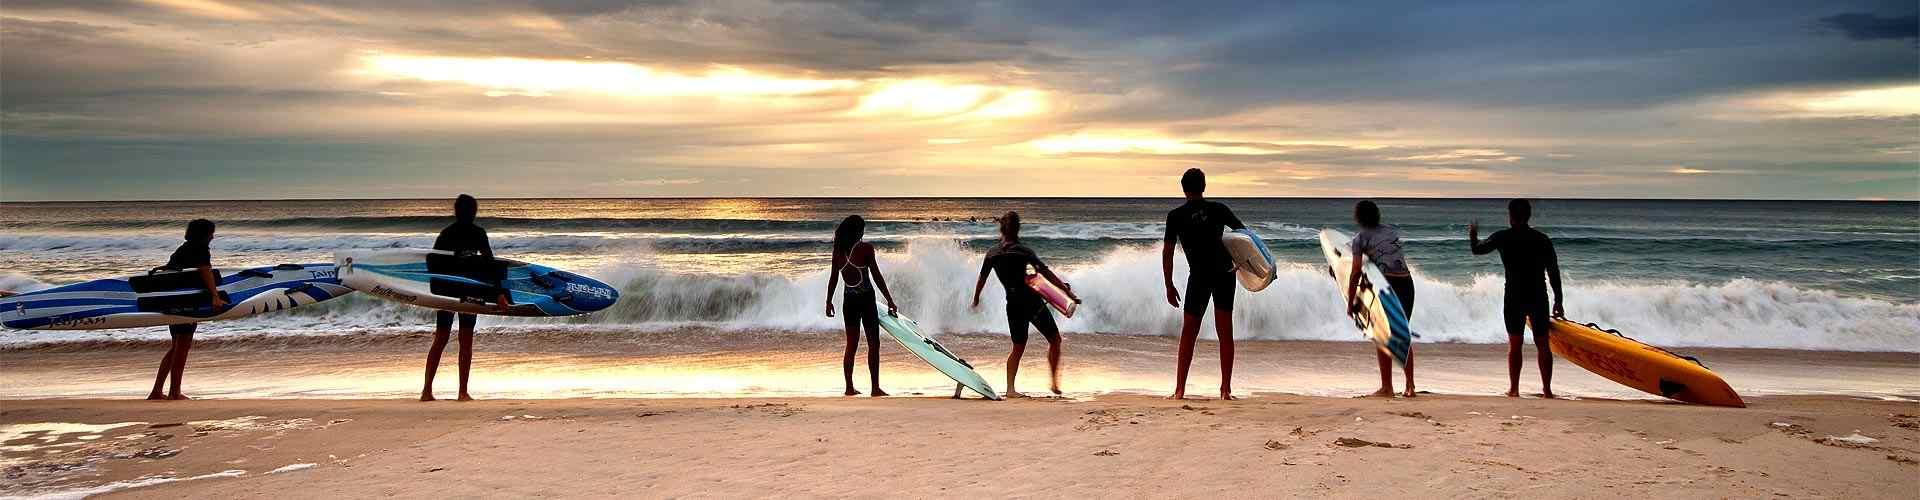 surf en centrosdeportes de Vilanova del Vallès